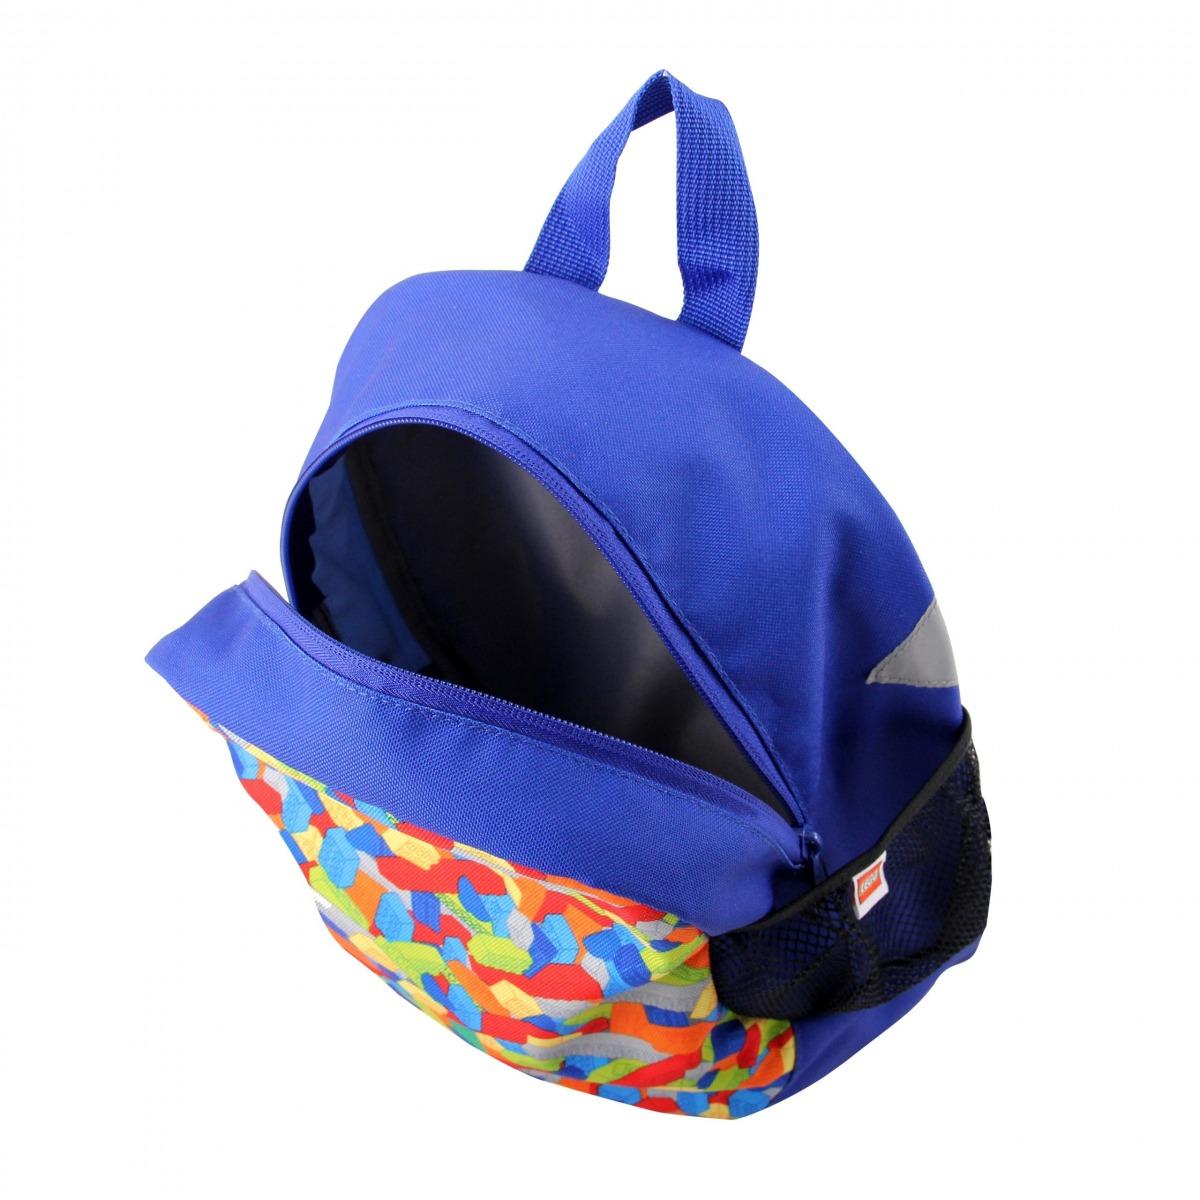 lego 5005927 kindergarten rucksack scaled